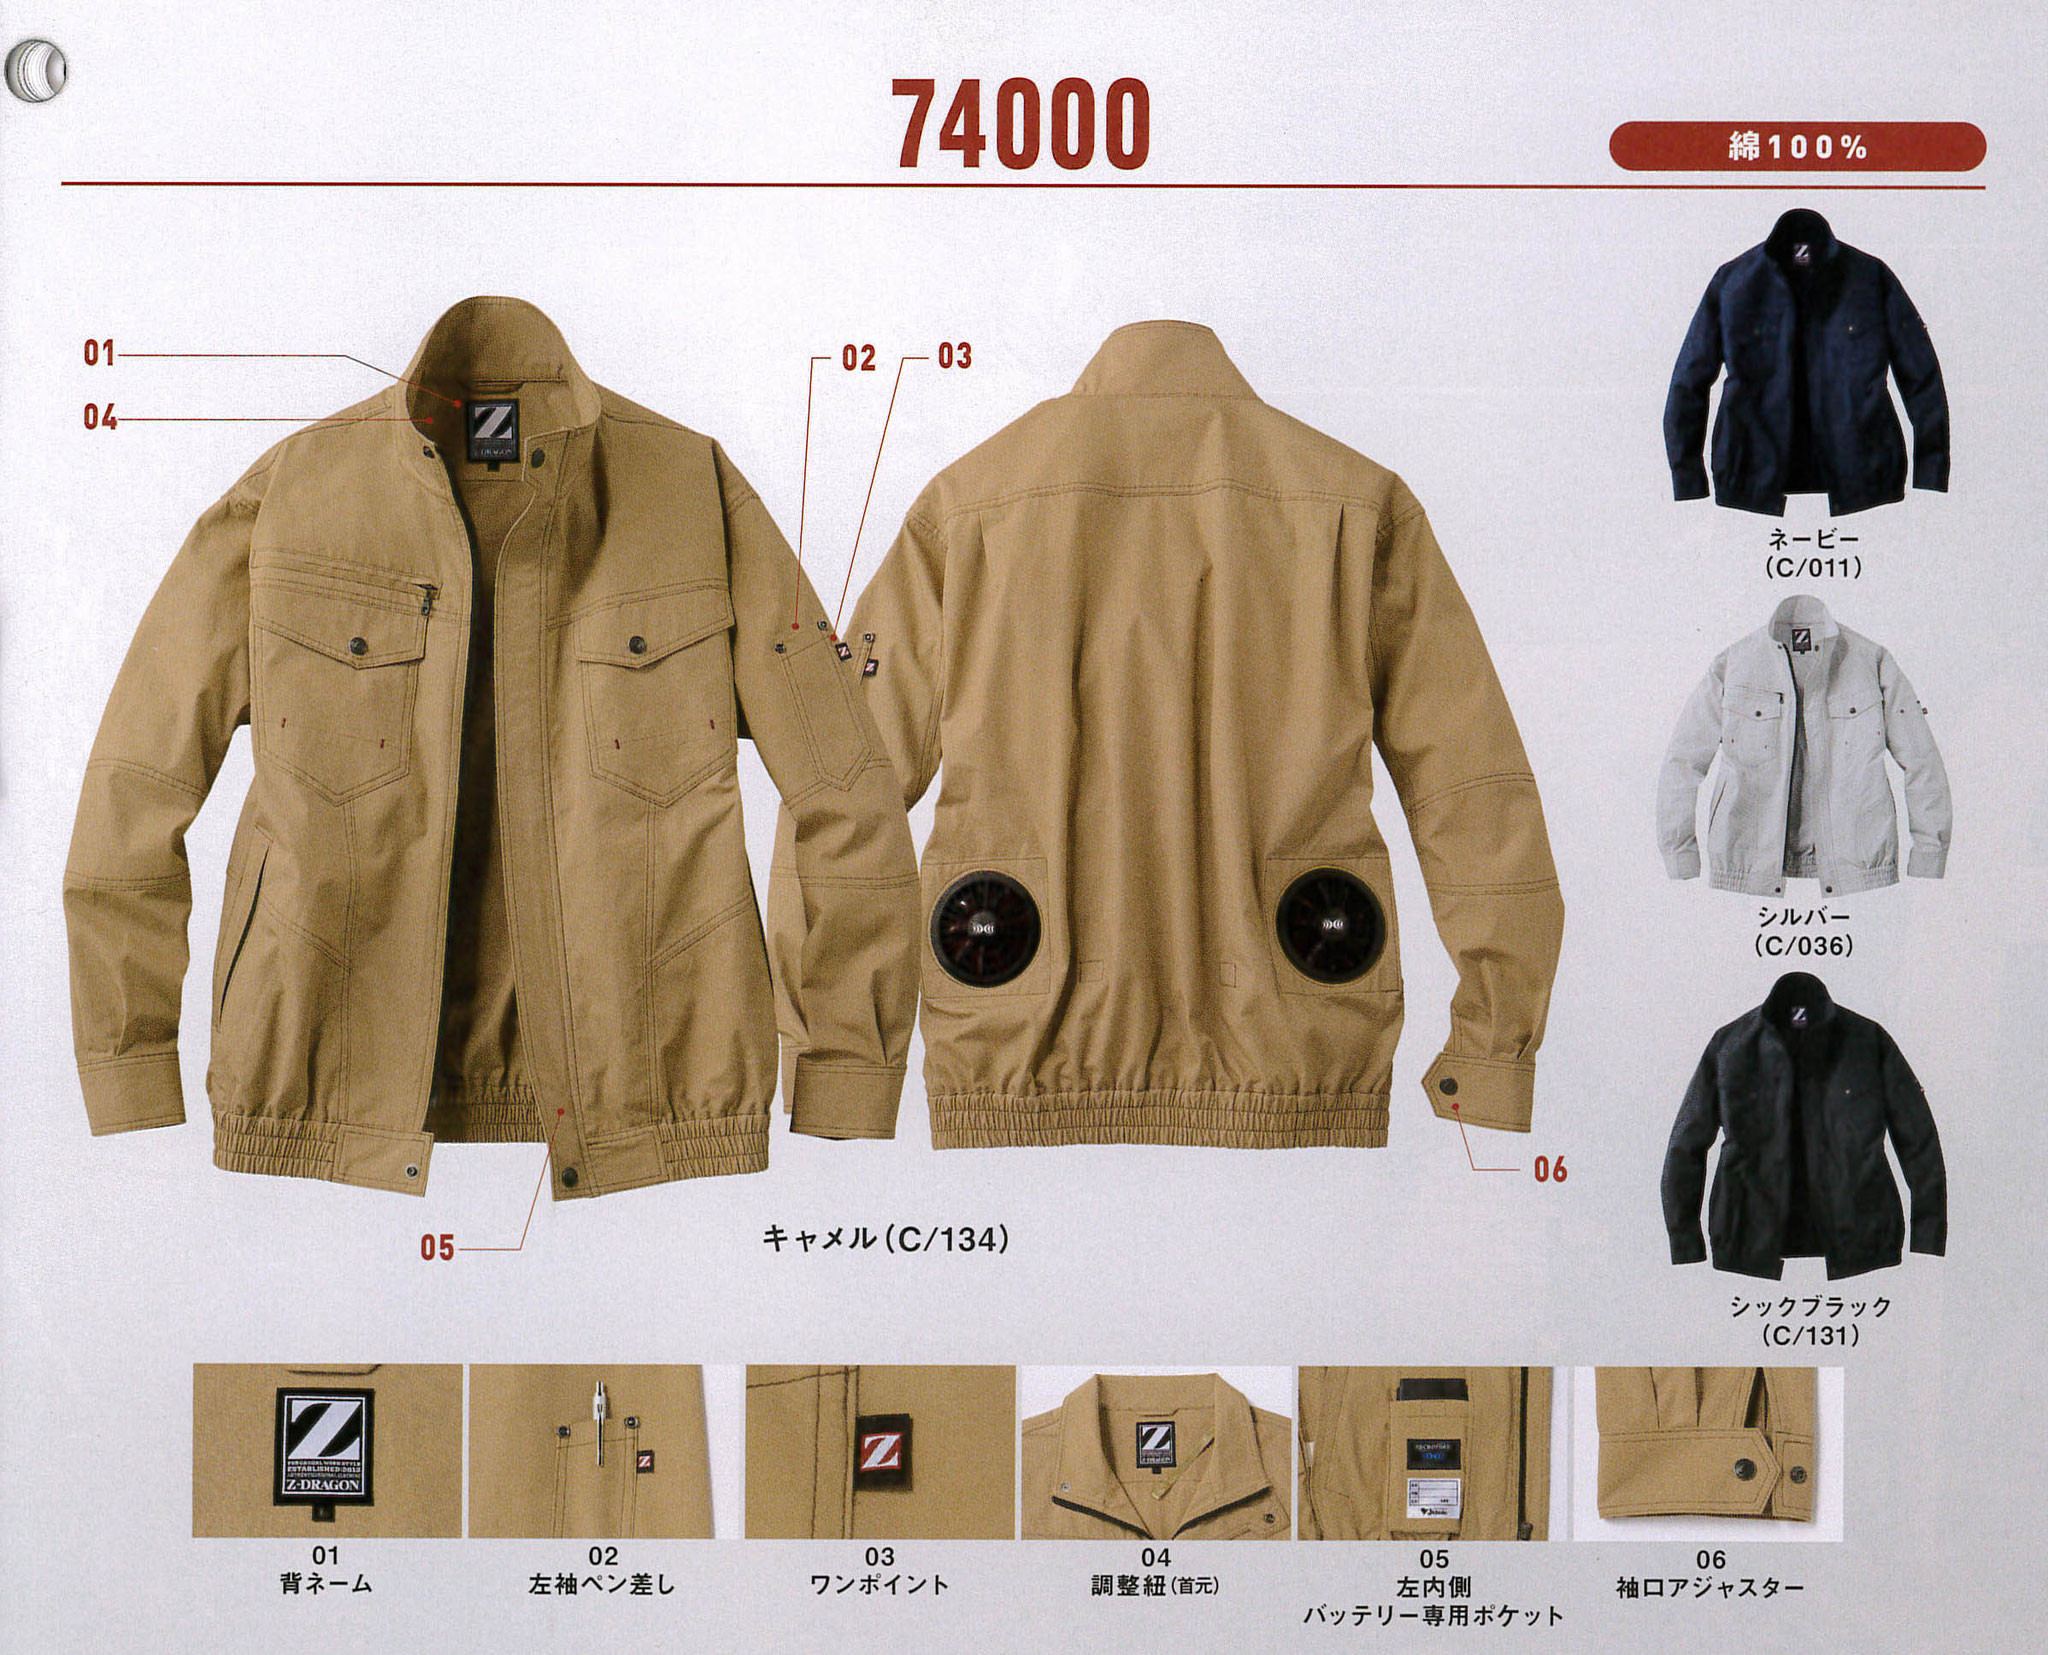 Z-DRAGON(ジードラゴン)74010 空調服ブルゾン 素材 綿100%